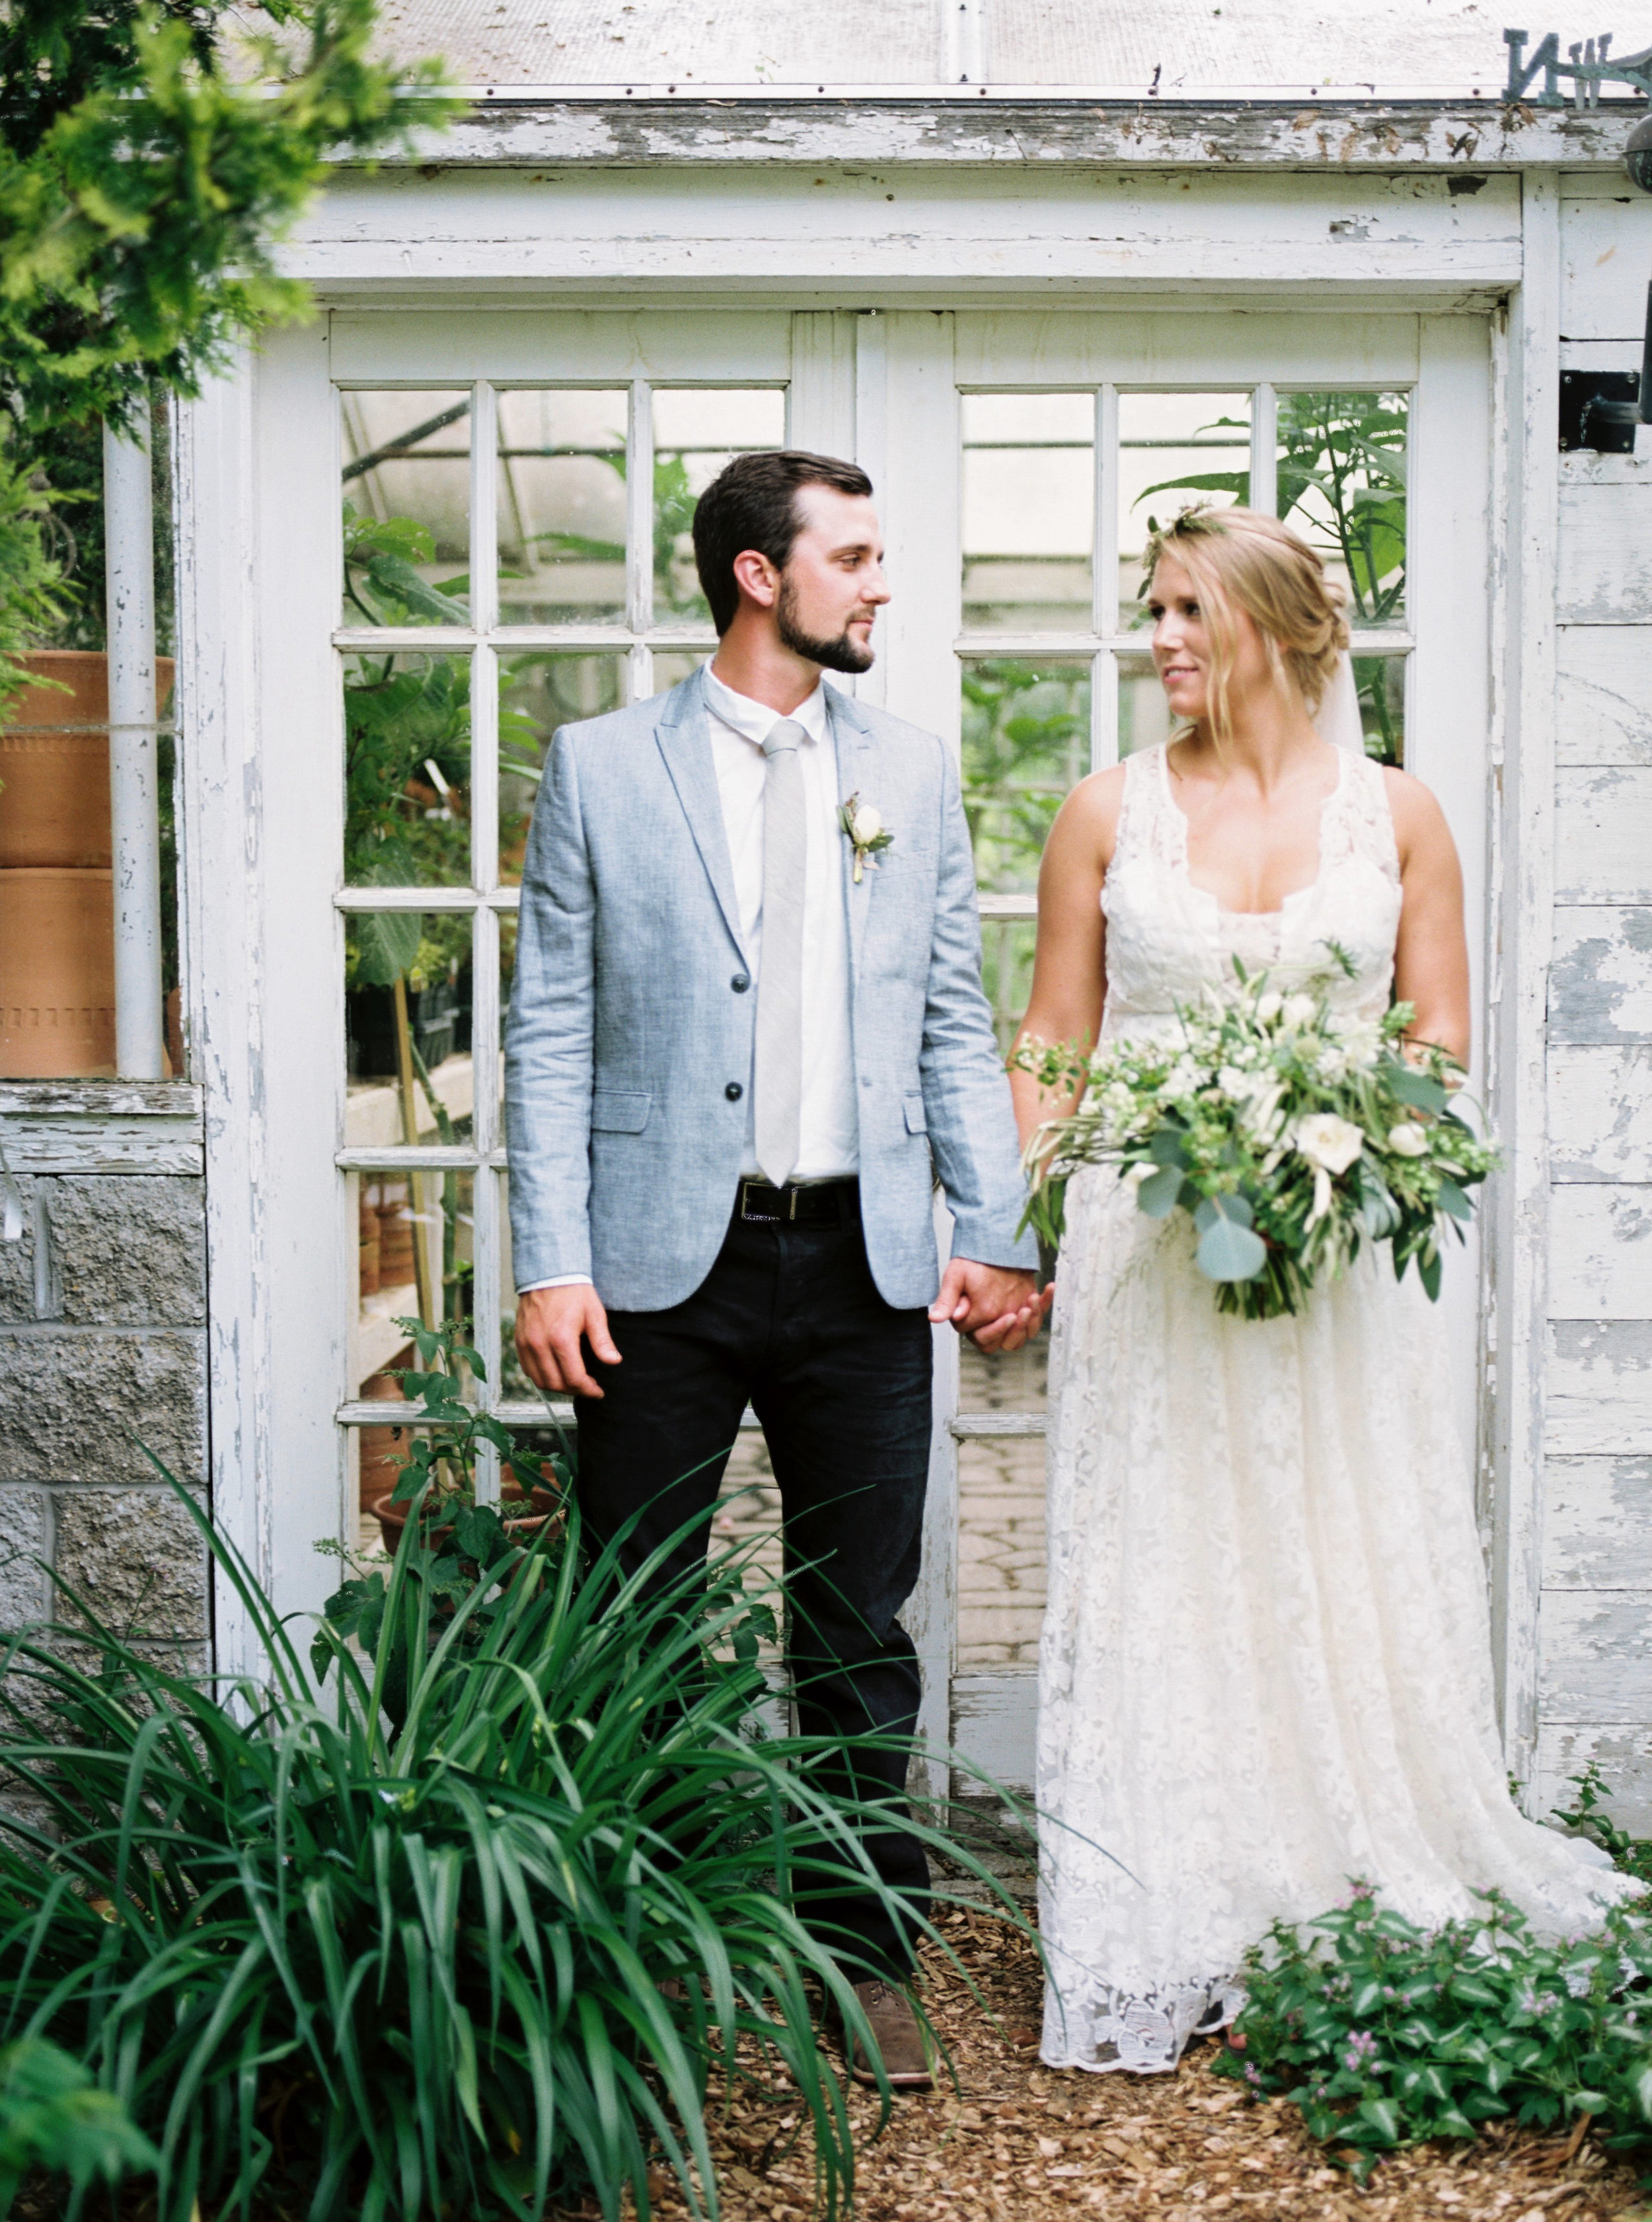 greenhouse-wedding-inspiration-by-laurelyn-savannah-photography-129.jpg